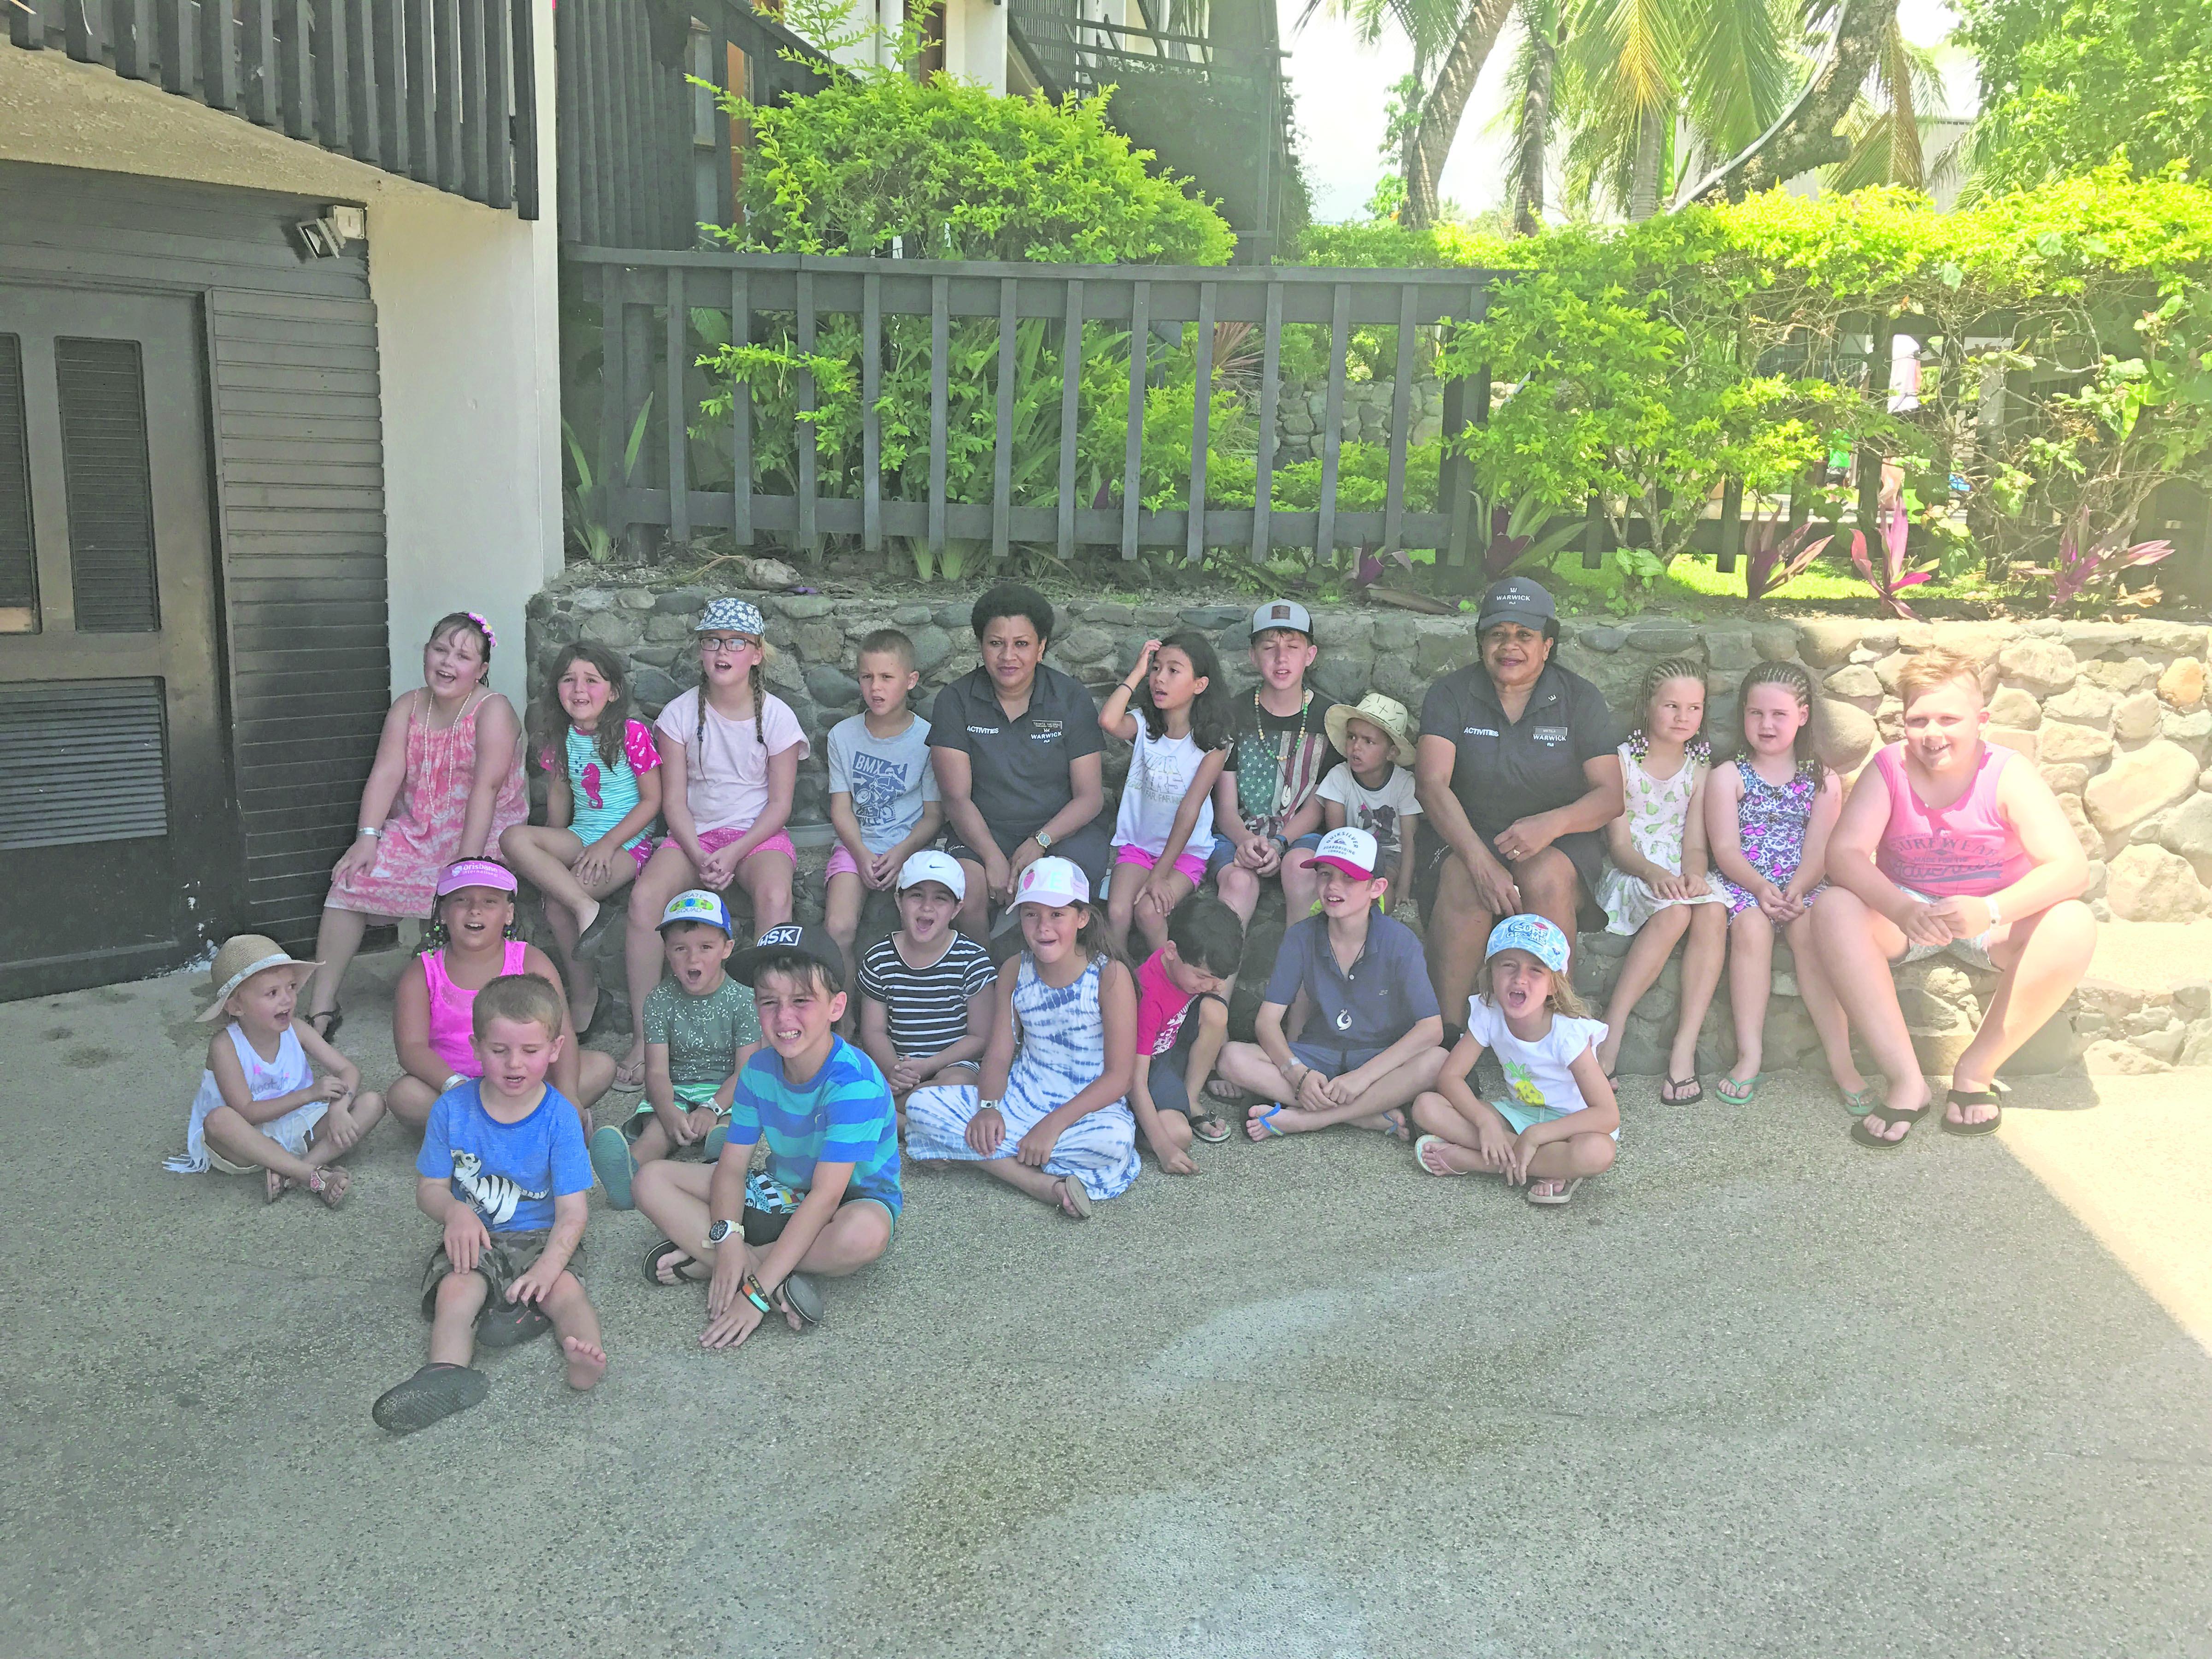 Staff of Warwick Fiji with children at the resort on January 5, 2018. Photo: Maraia Vula